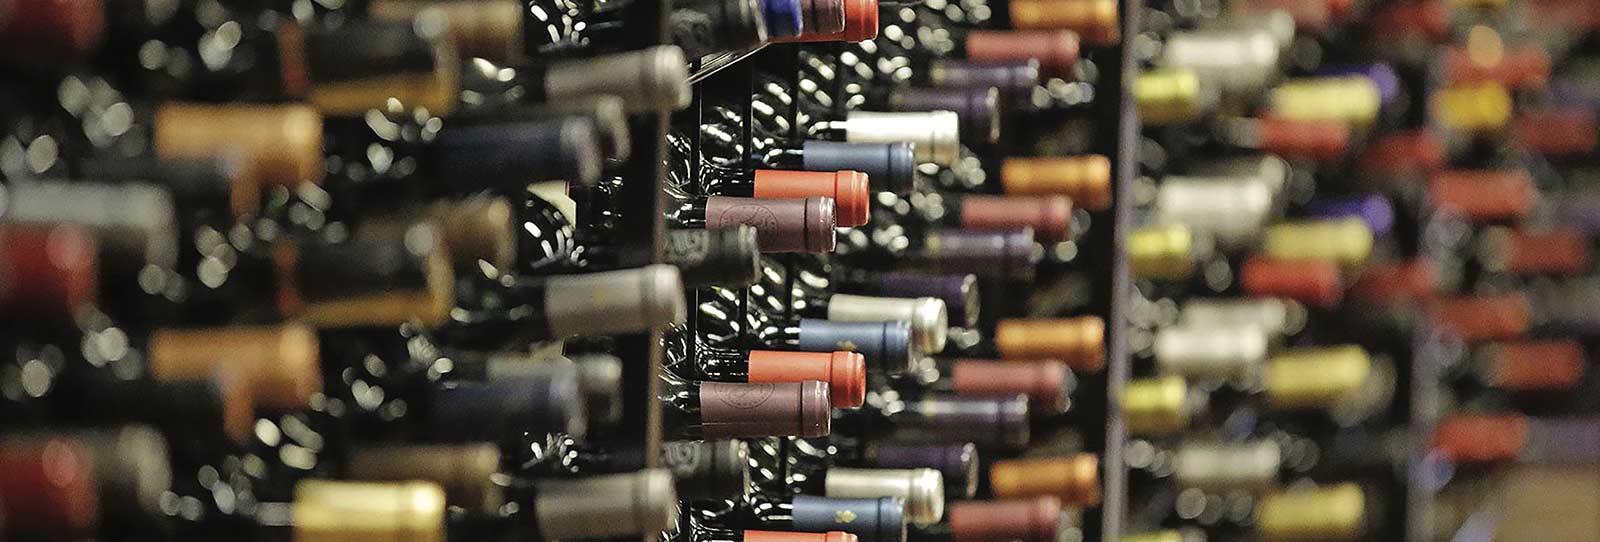 bodega vinos gallegos